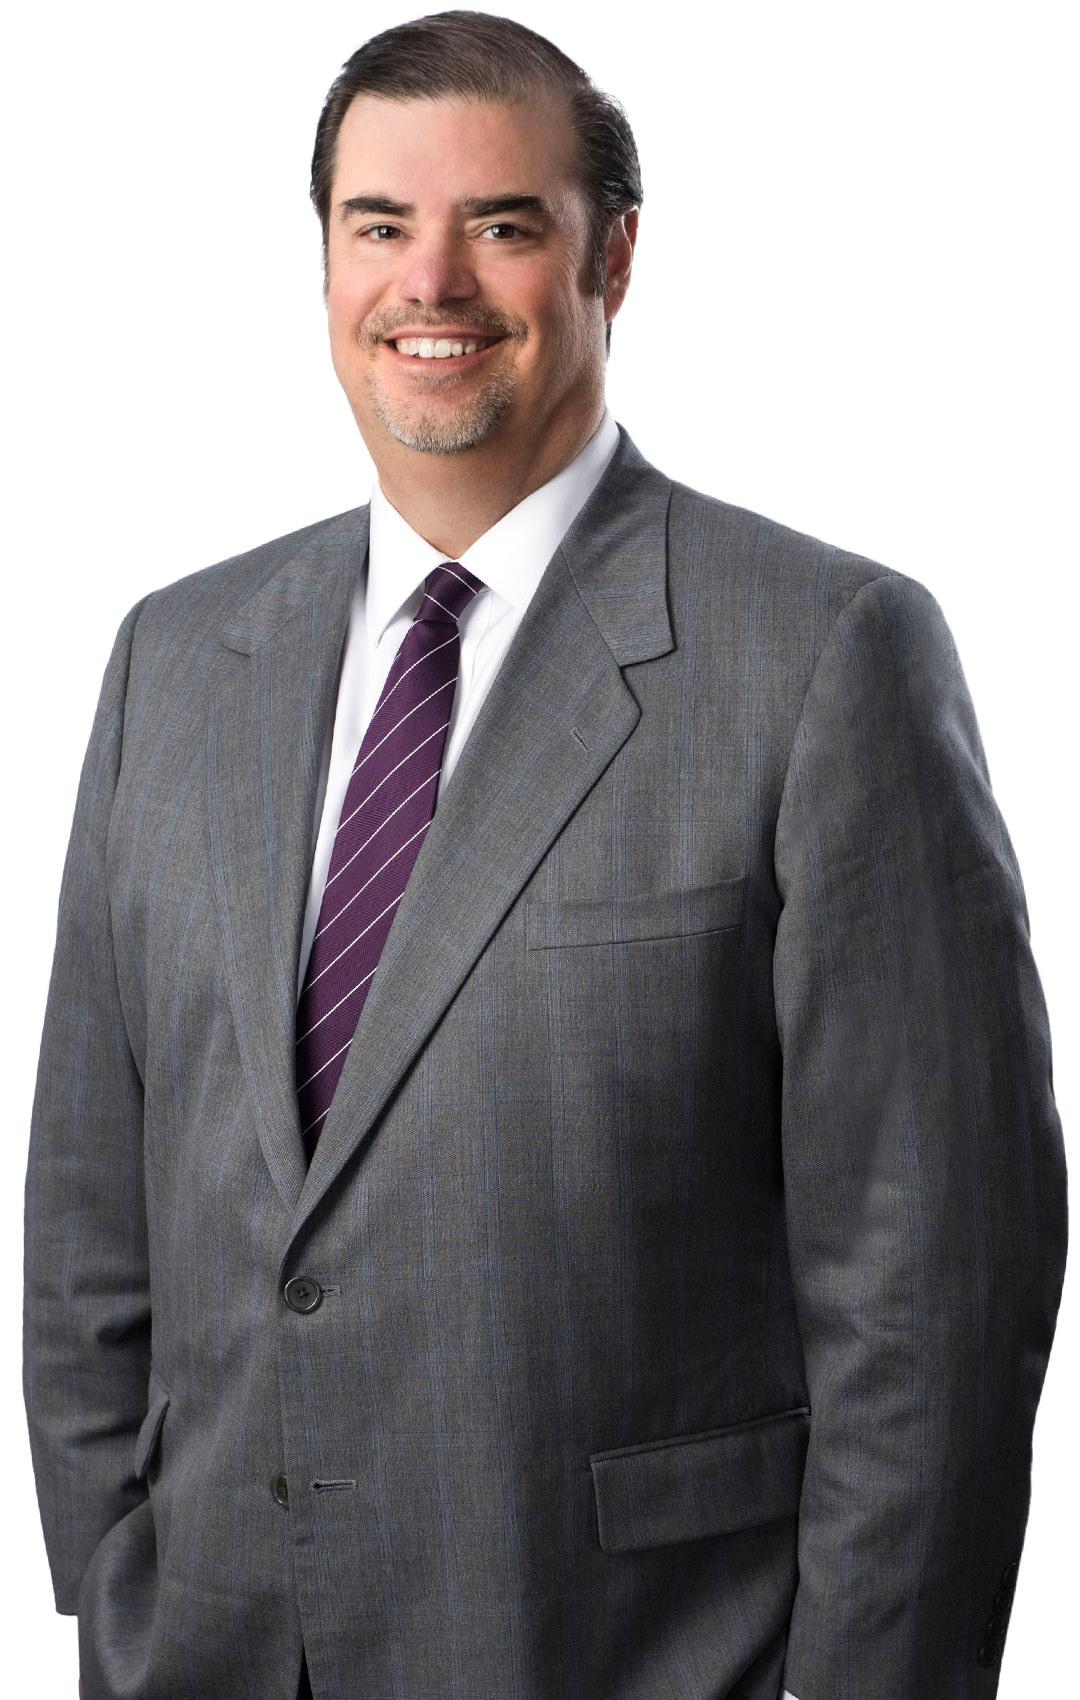 Robert L. Massie